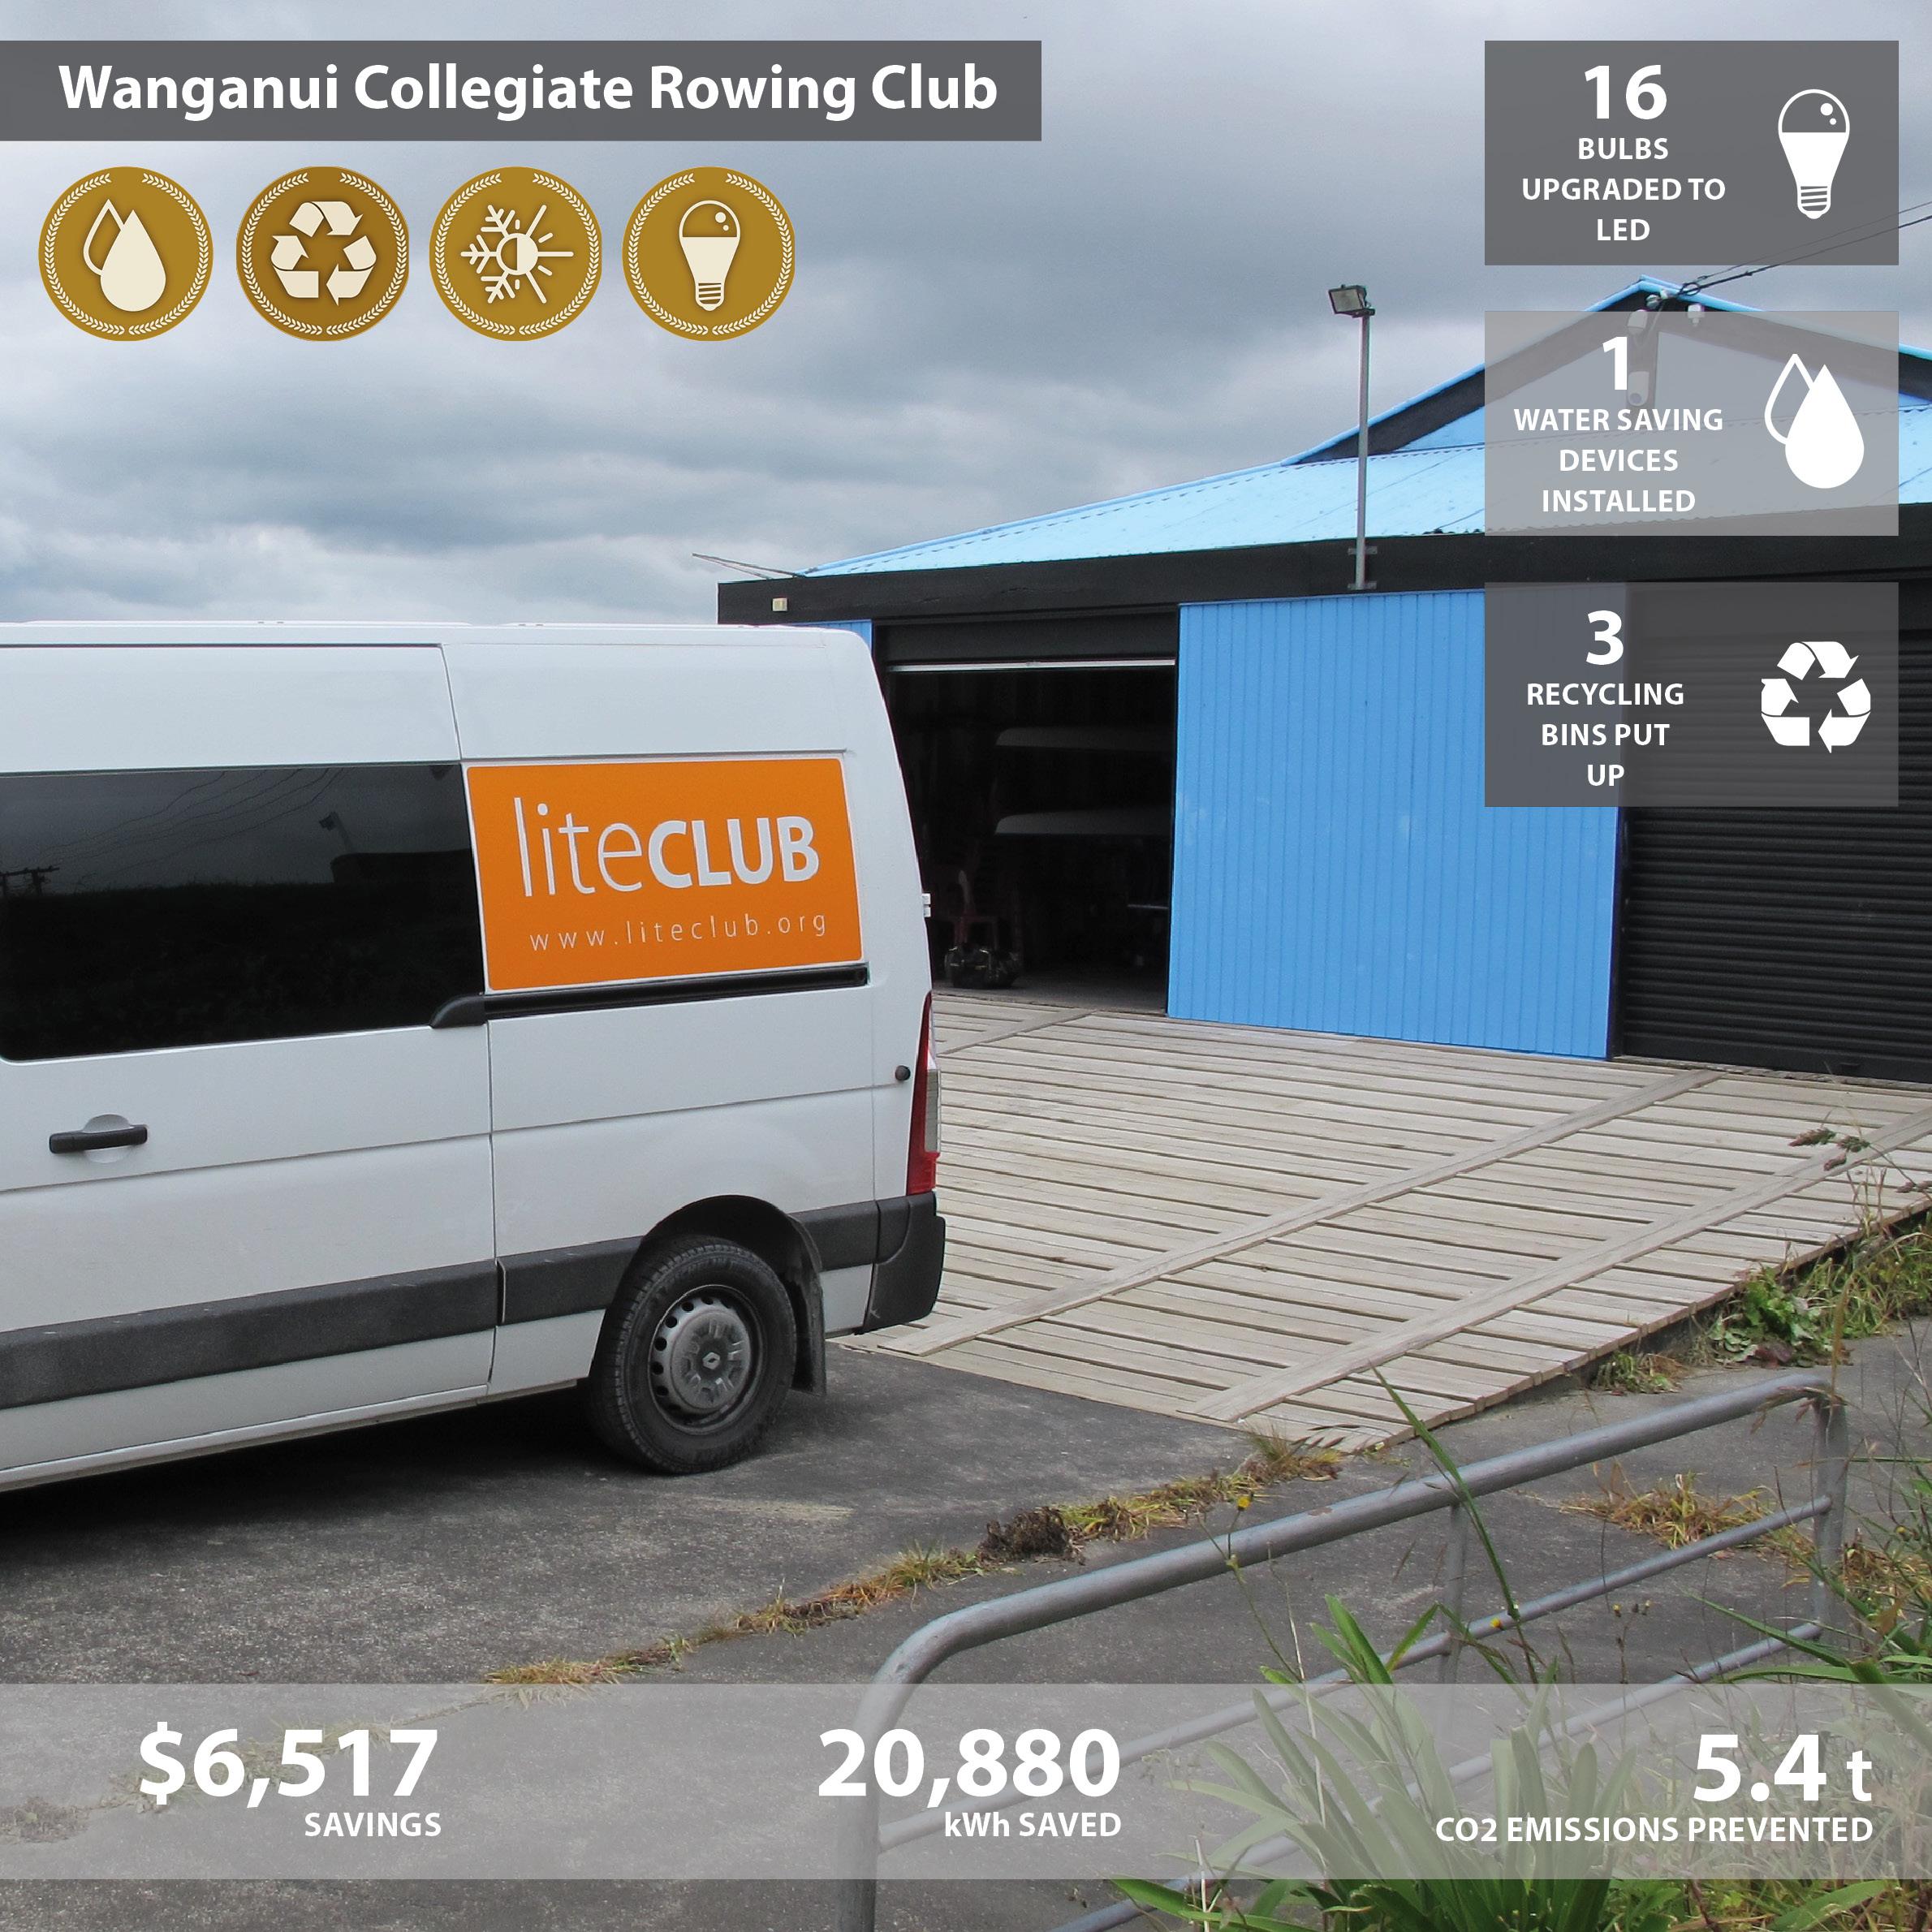 Wanganui Collegiate Rowing Club